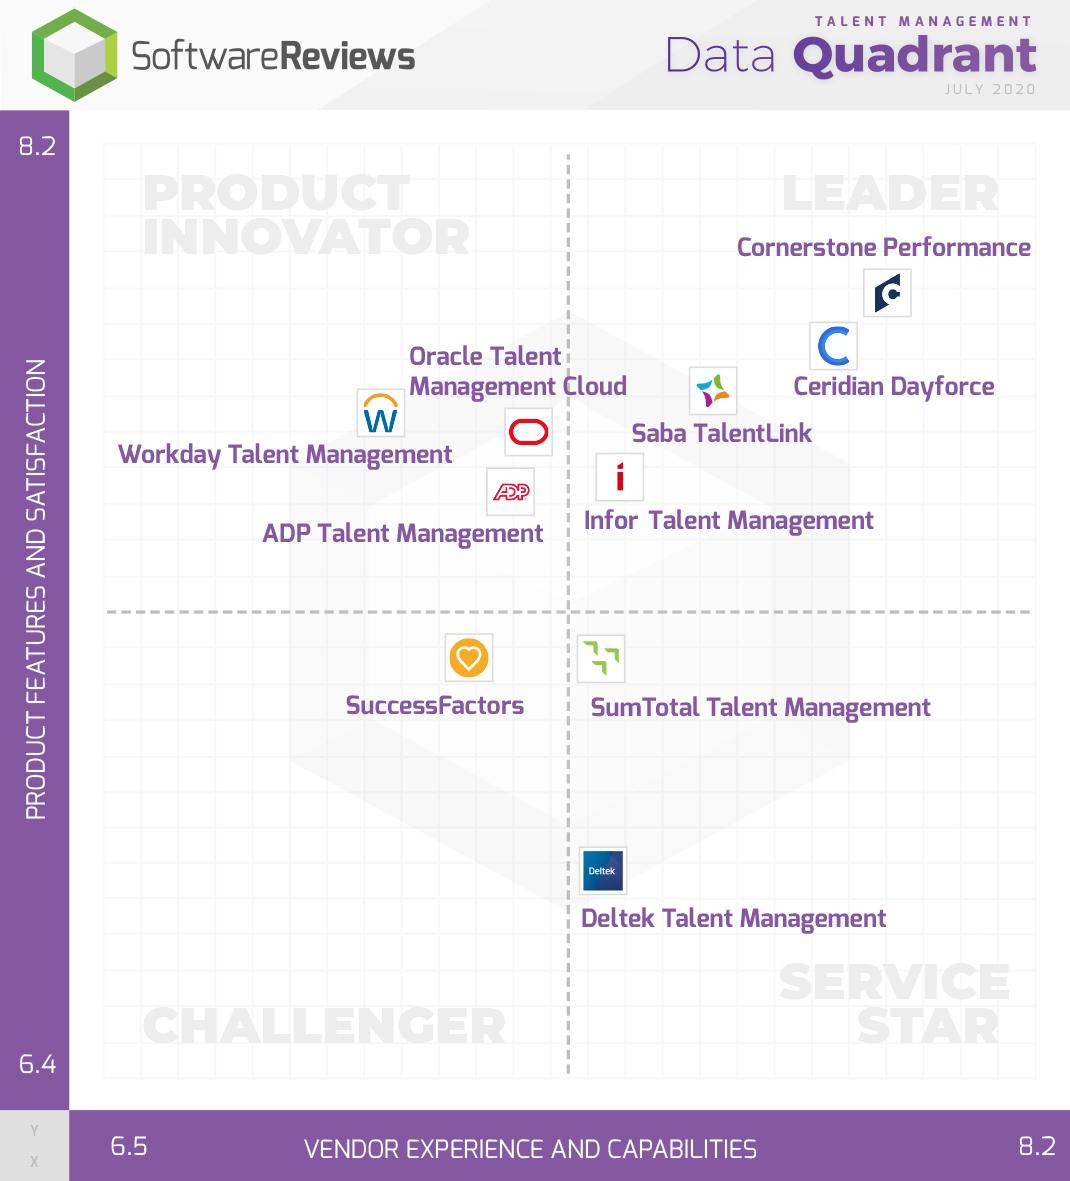 Talent Management Data Quadrant